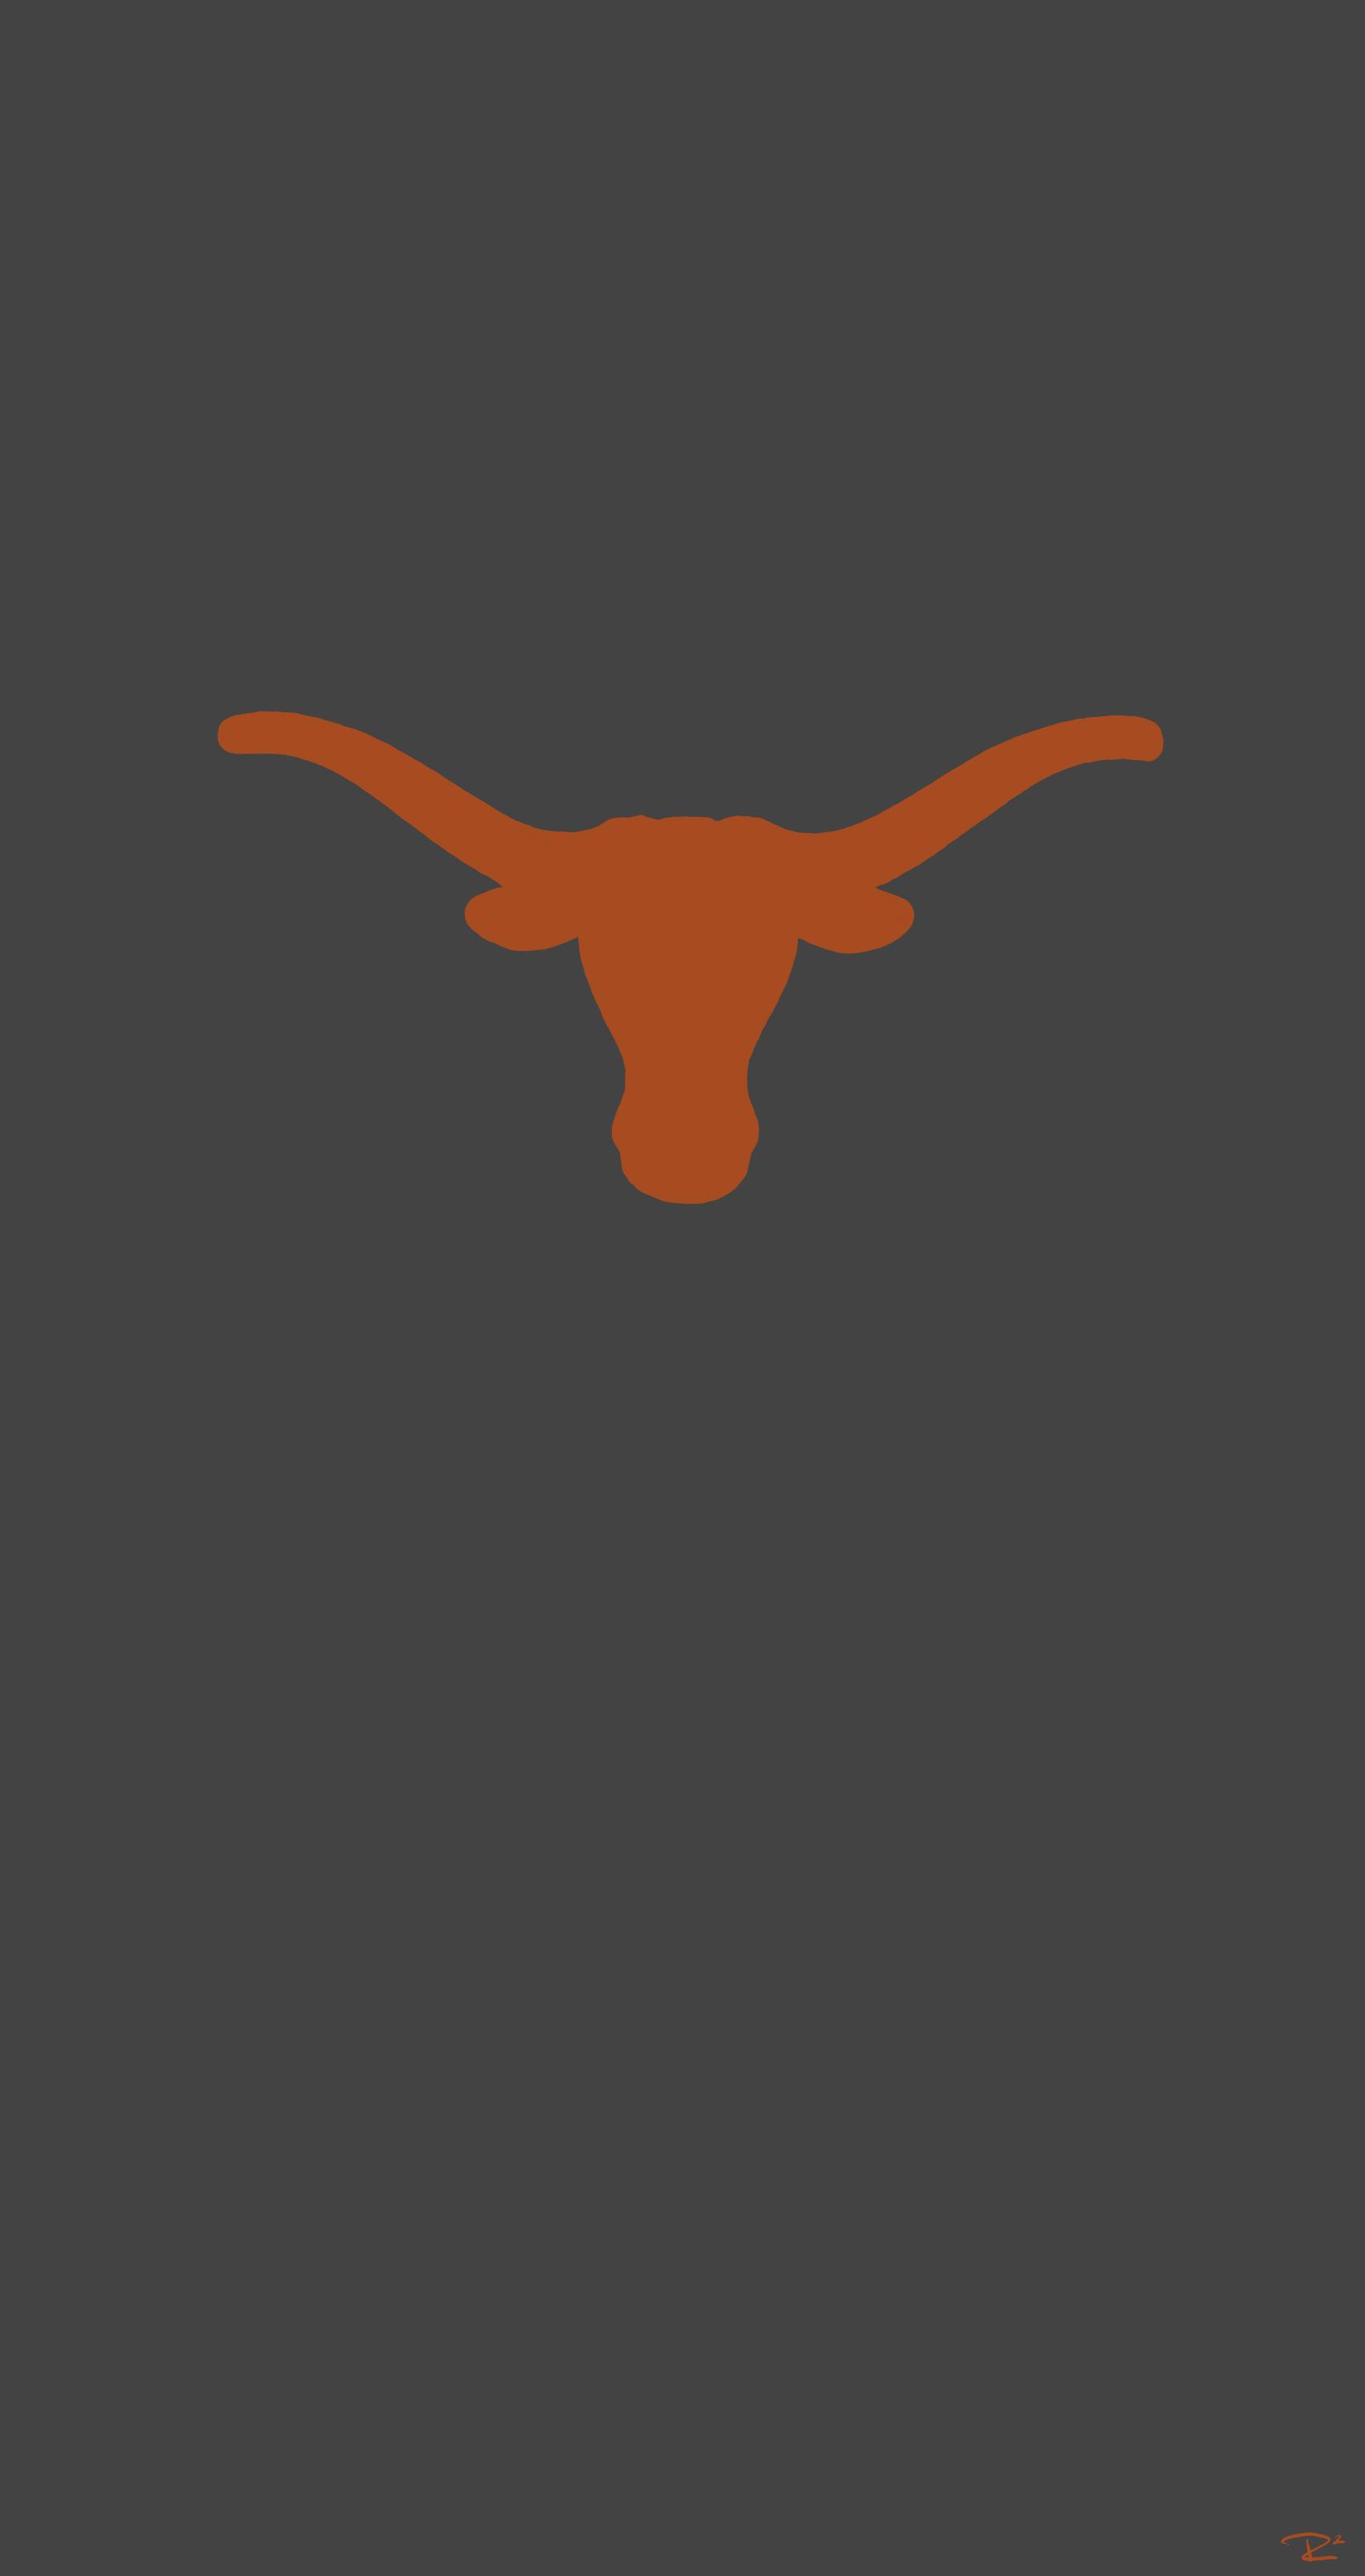 Texas Longhorn Wallpapers - Top Free